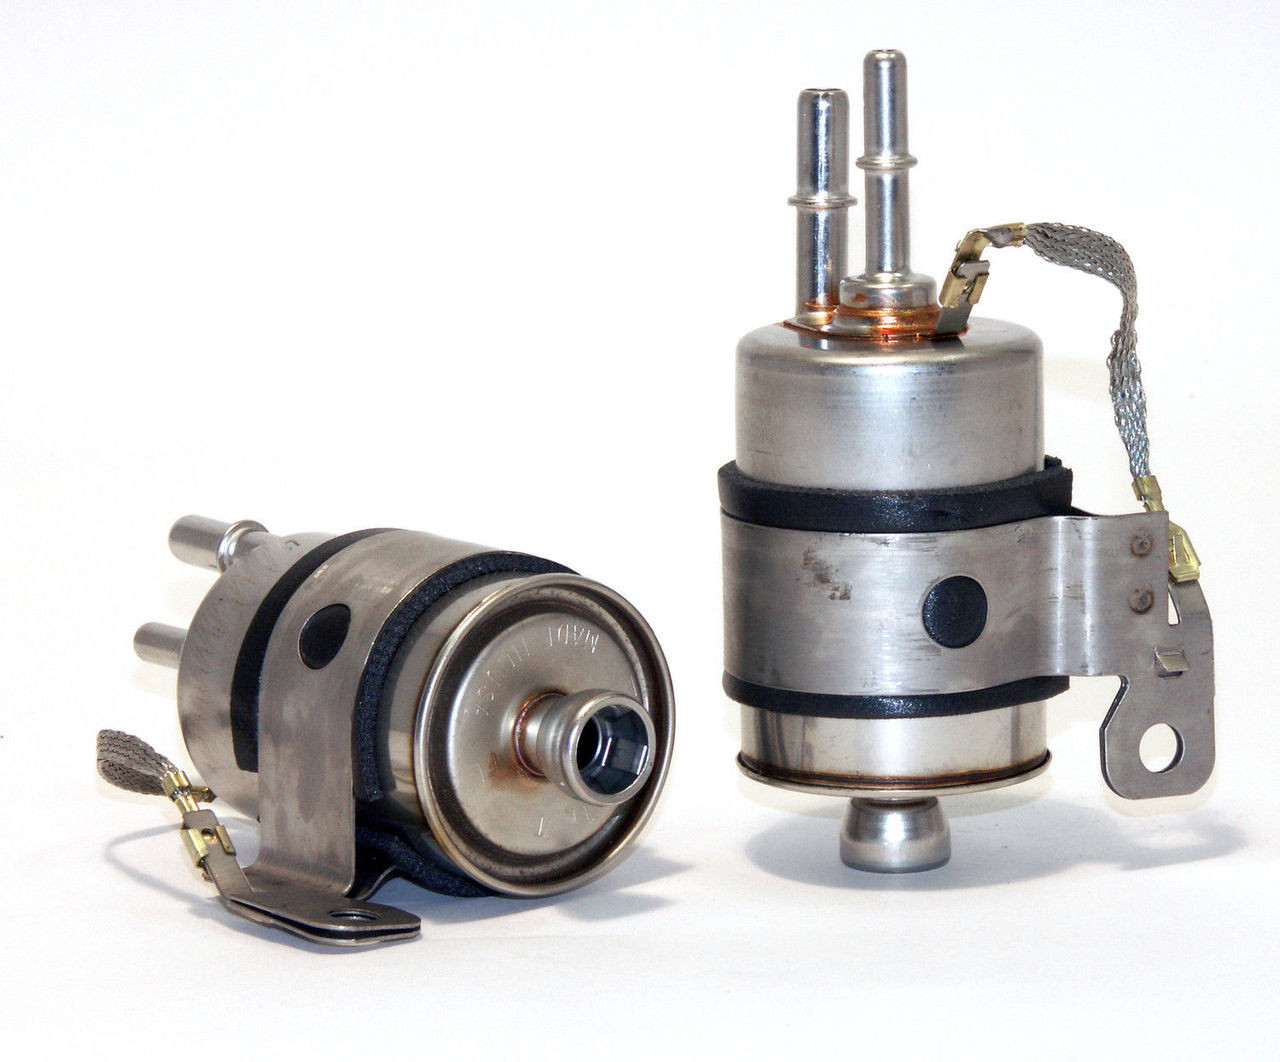 small resolution of ls1 lsx engine swap wix fuel filter w built in regulator hawksls1 fuel filter 5